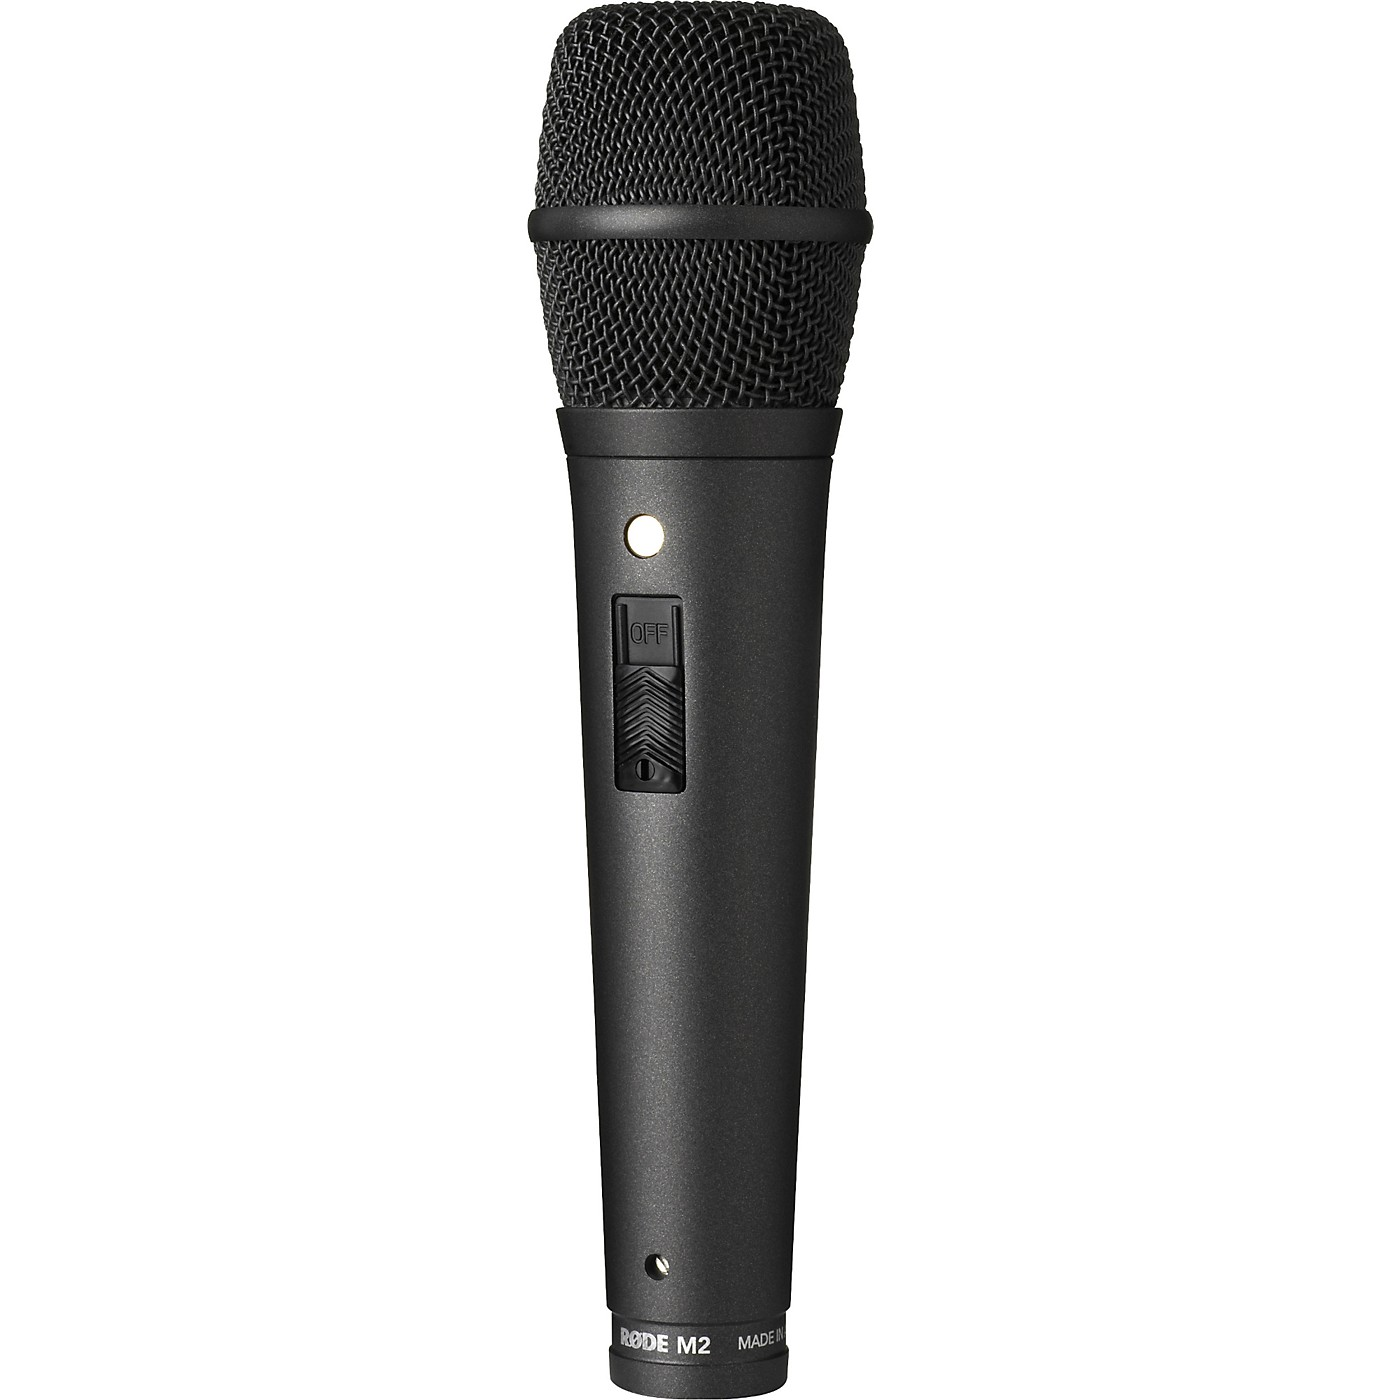 Rode M2 Handheld Condenser Microphone thumbnail